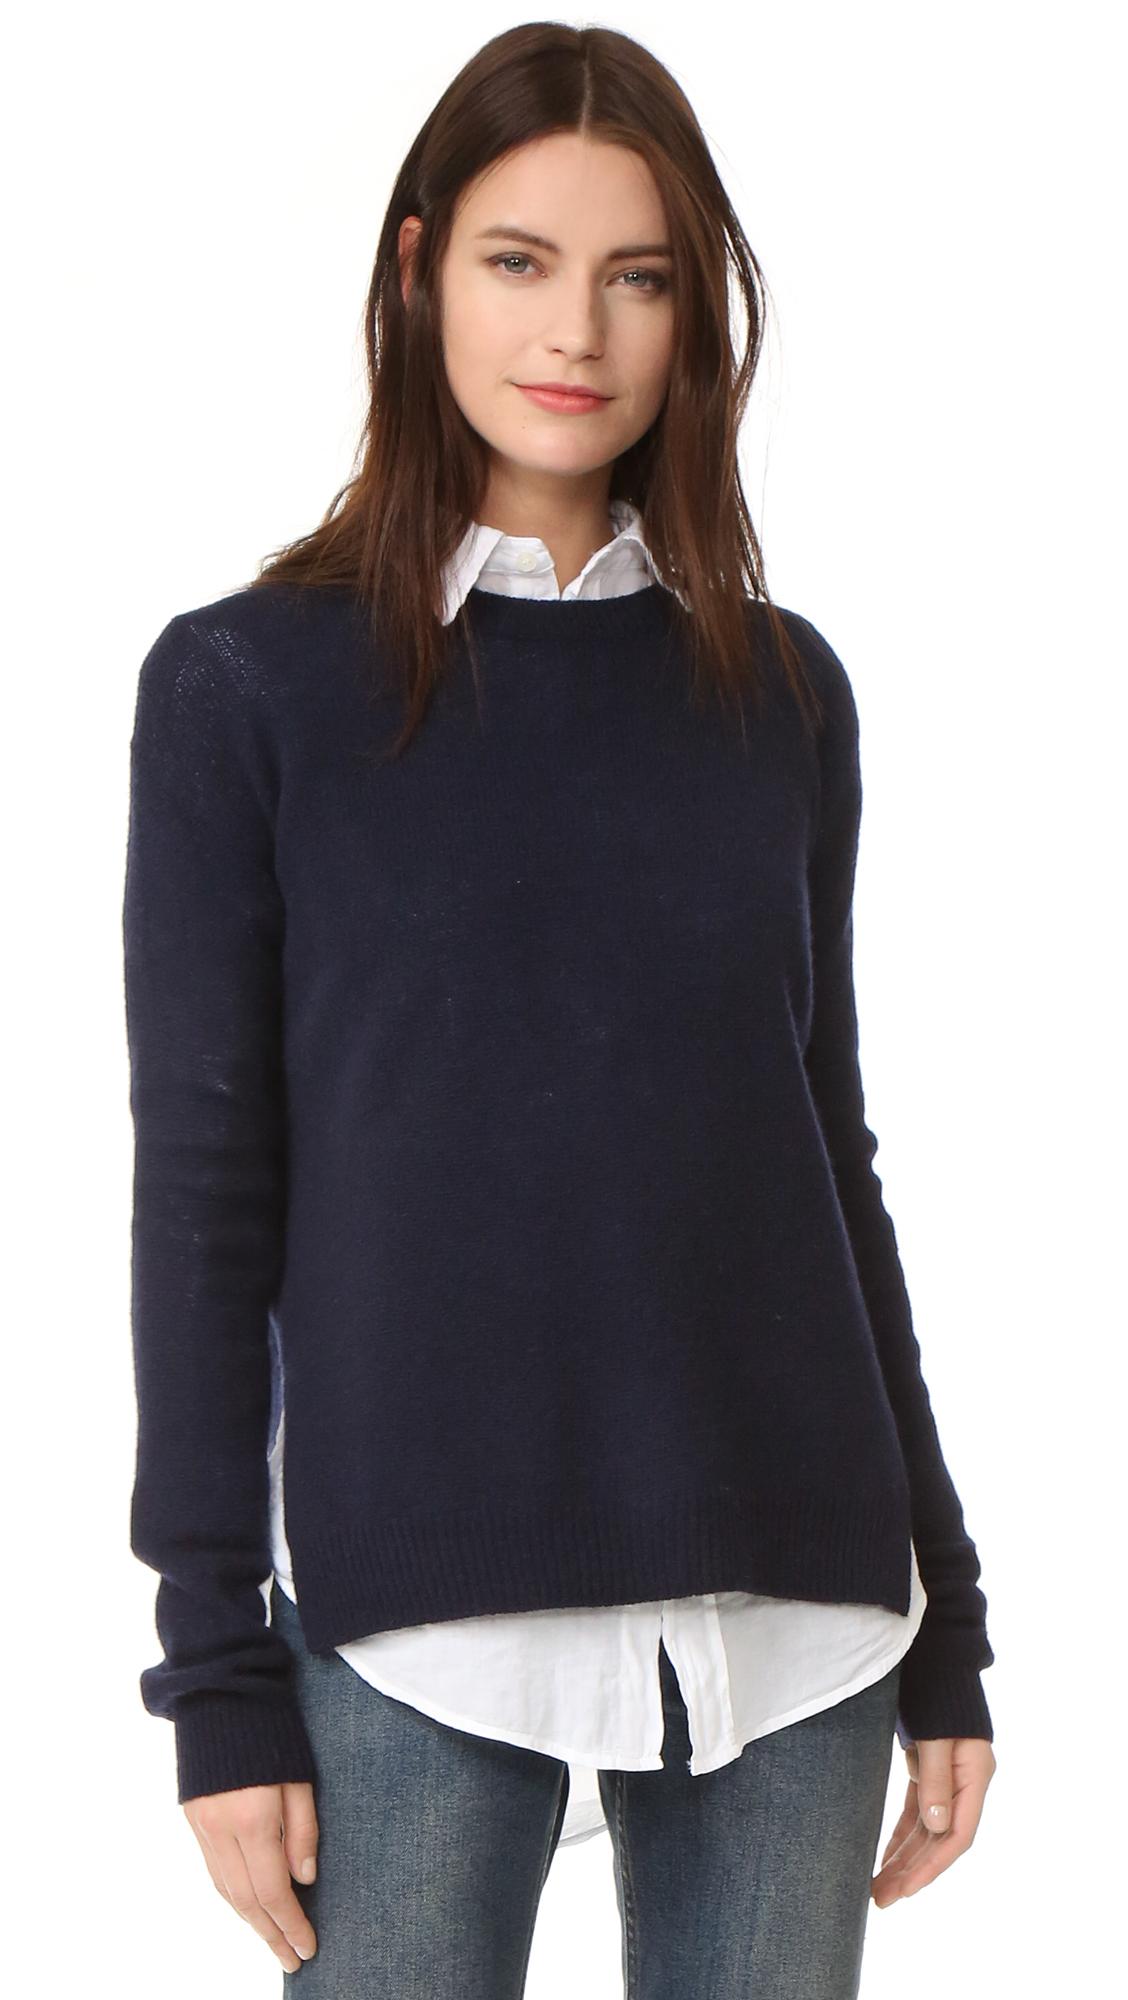 Acne Studios Deniz Wool Sweater - Navy at Shopbop